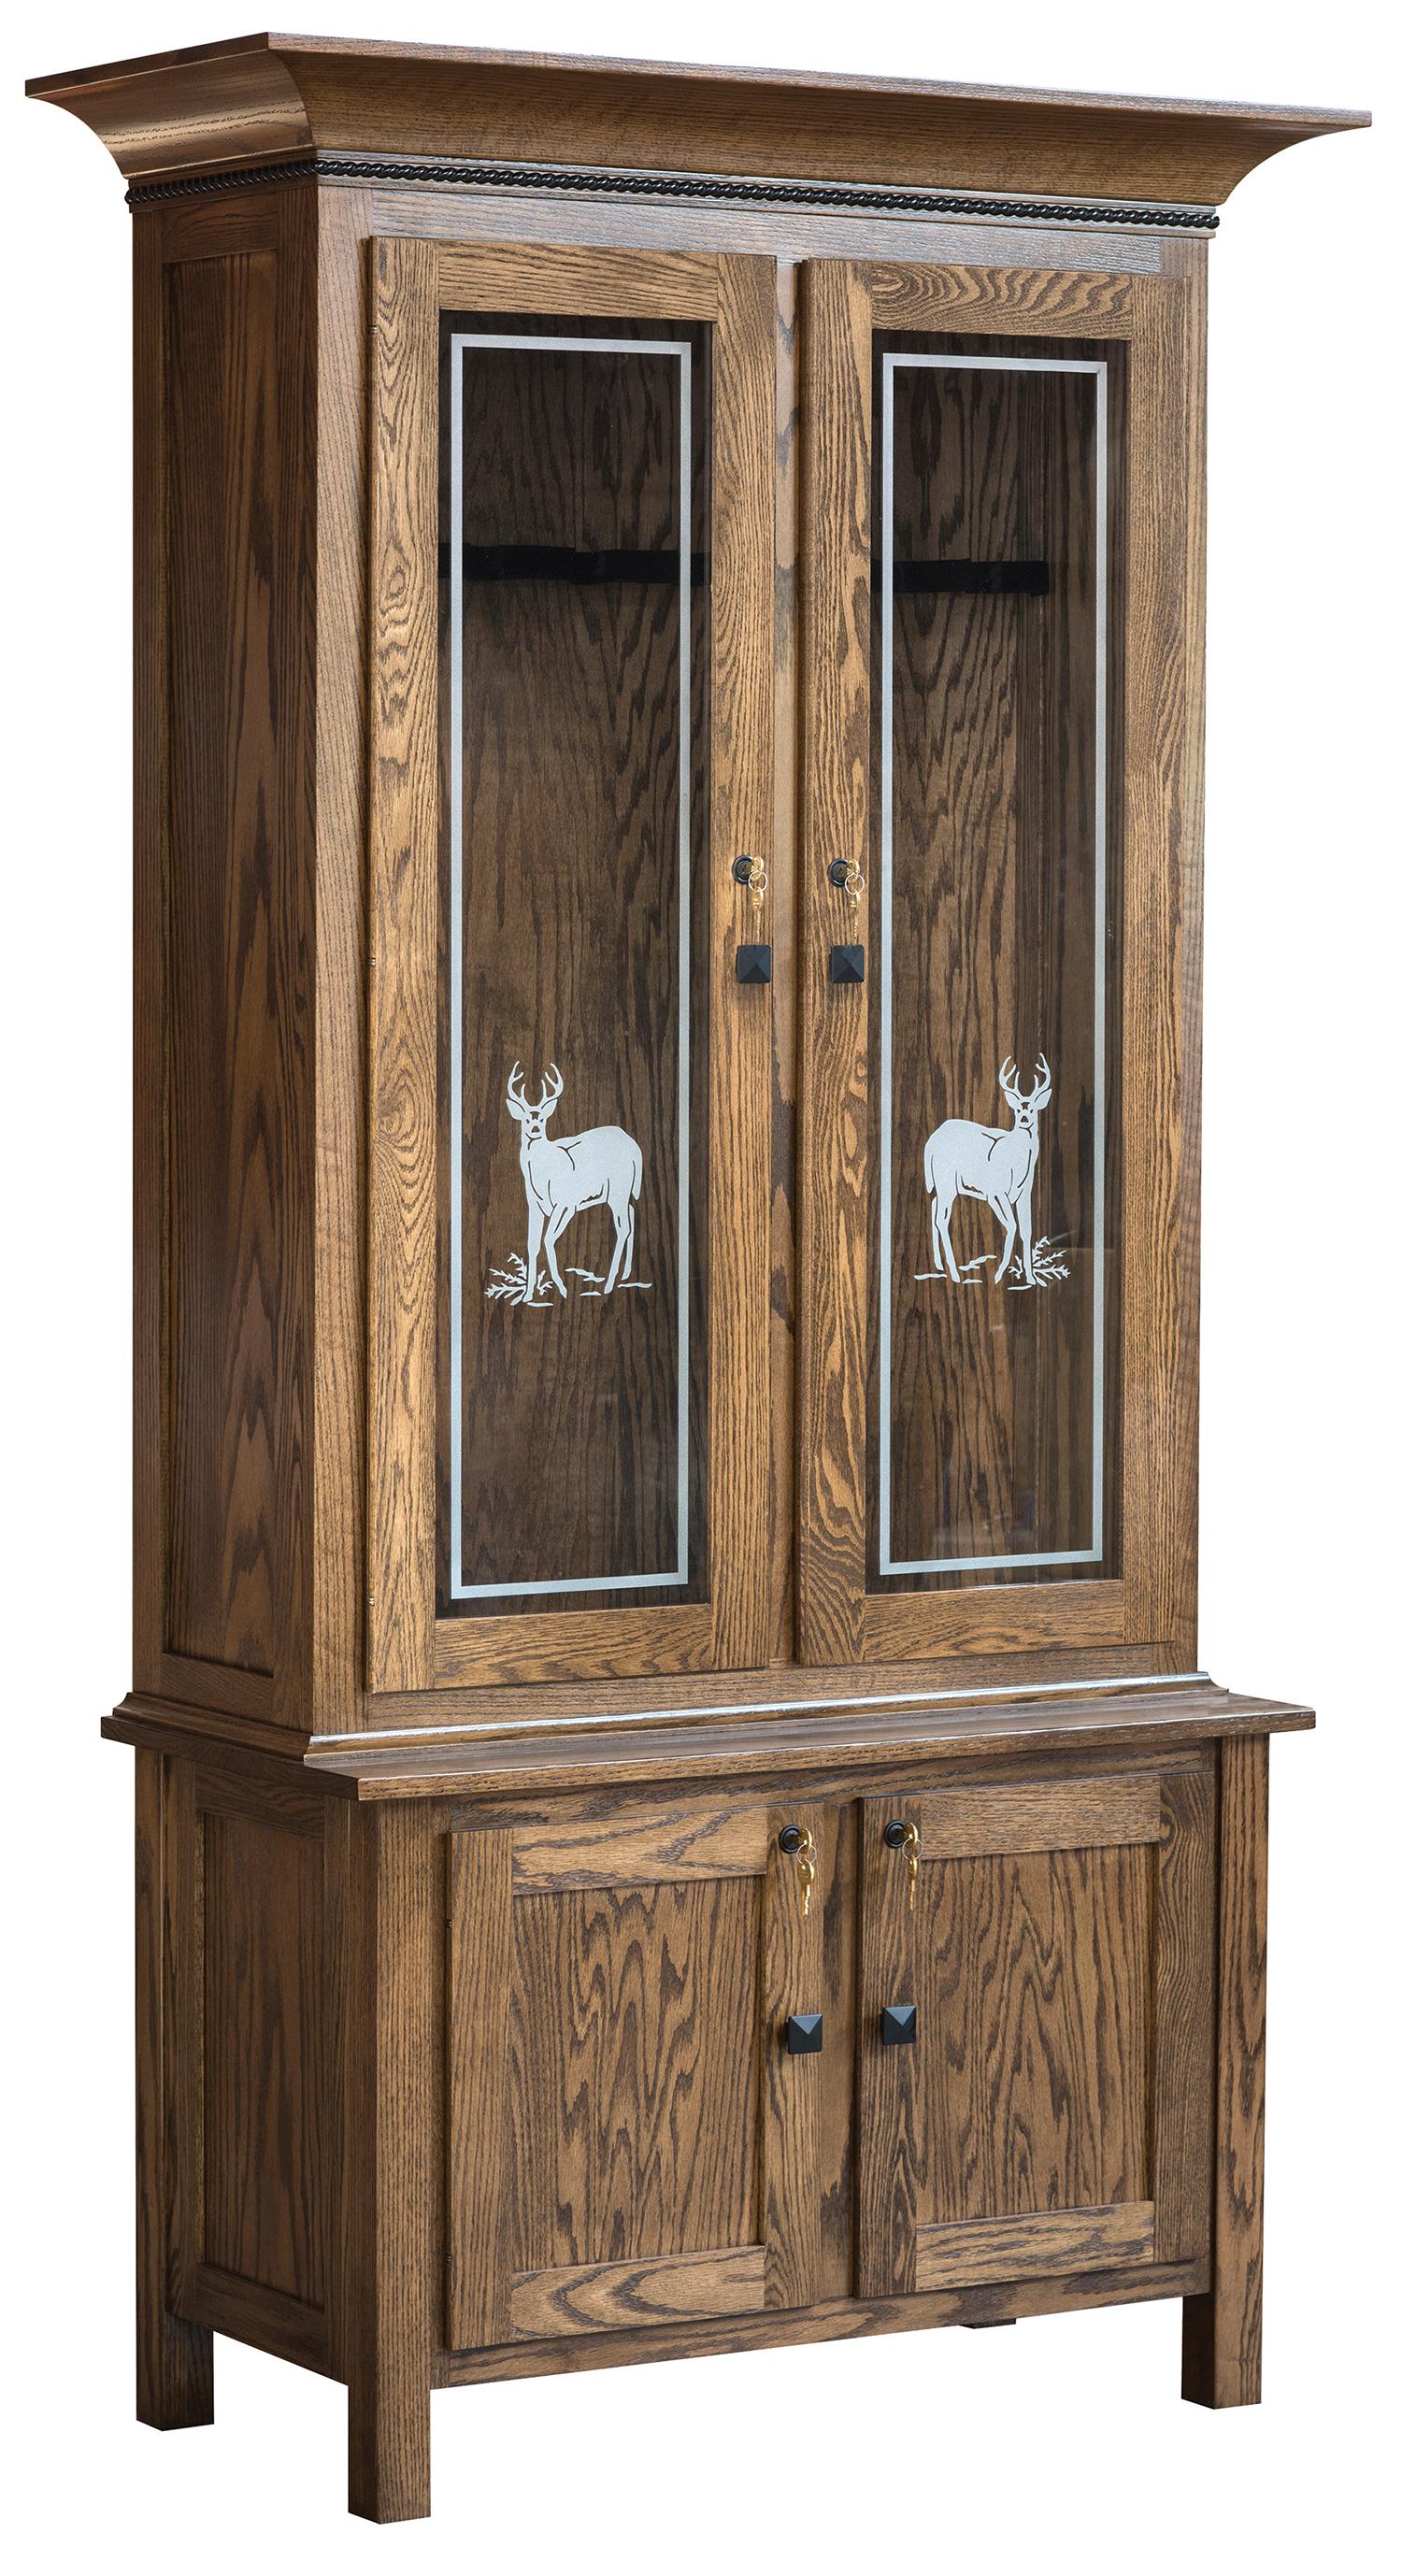 Secret Storage in hardwood furniture